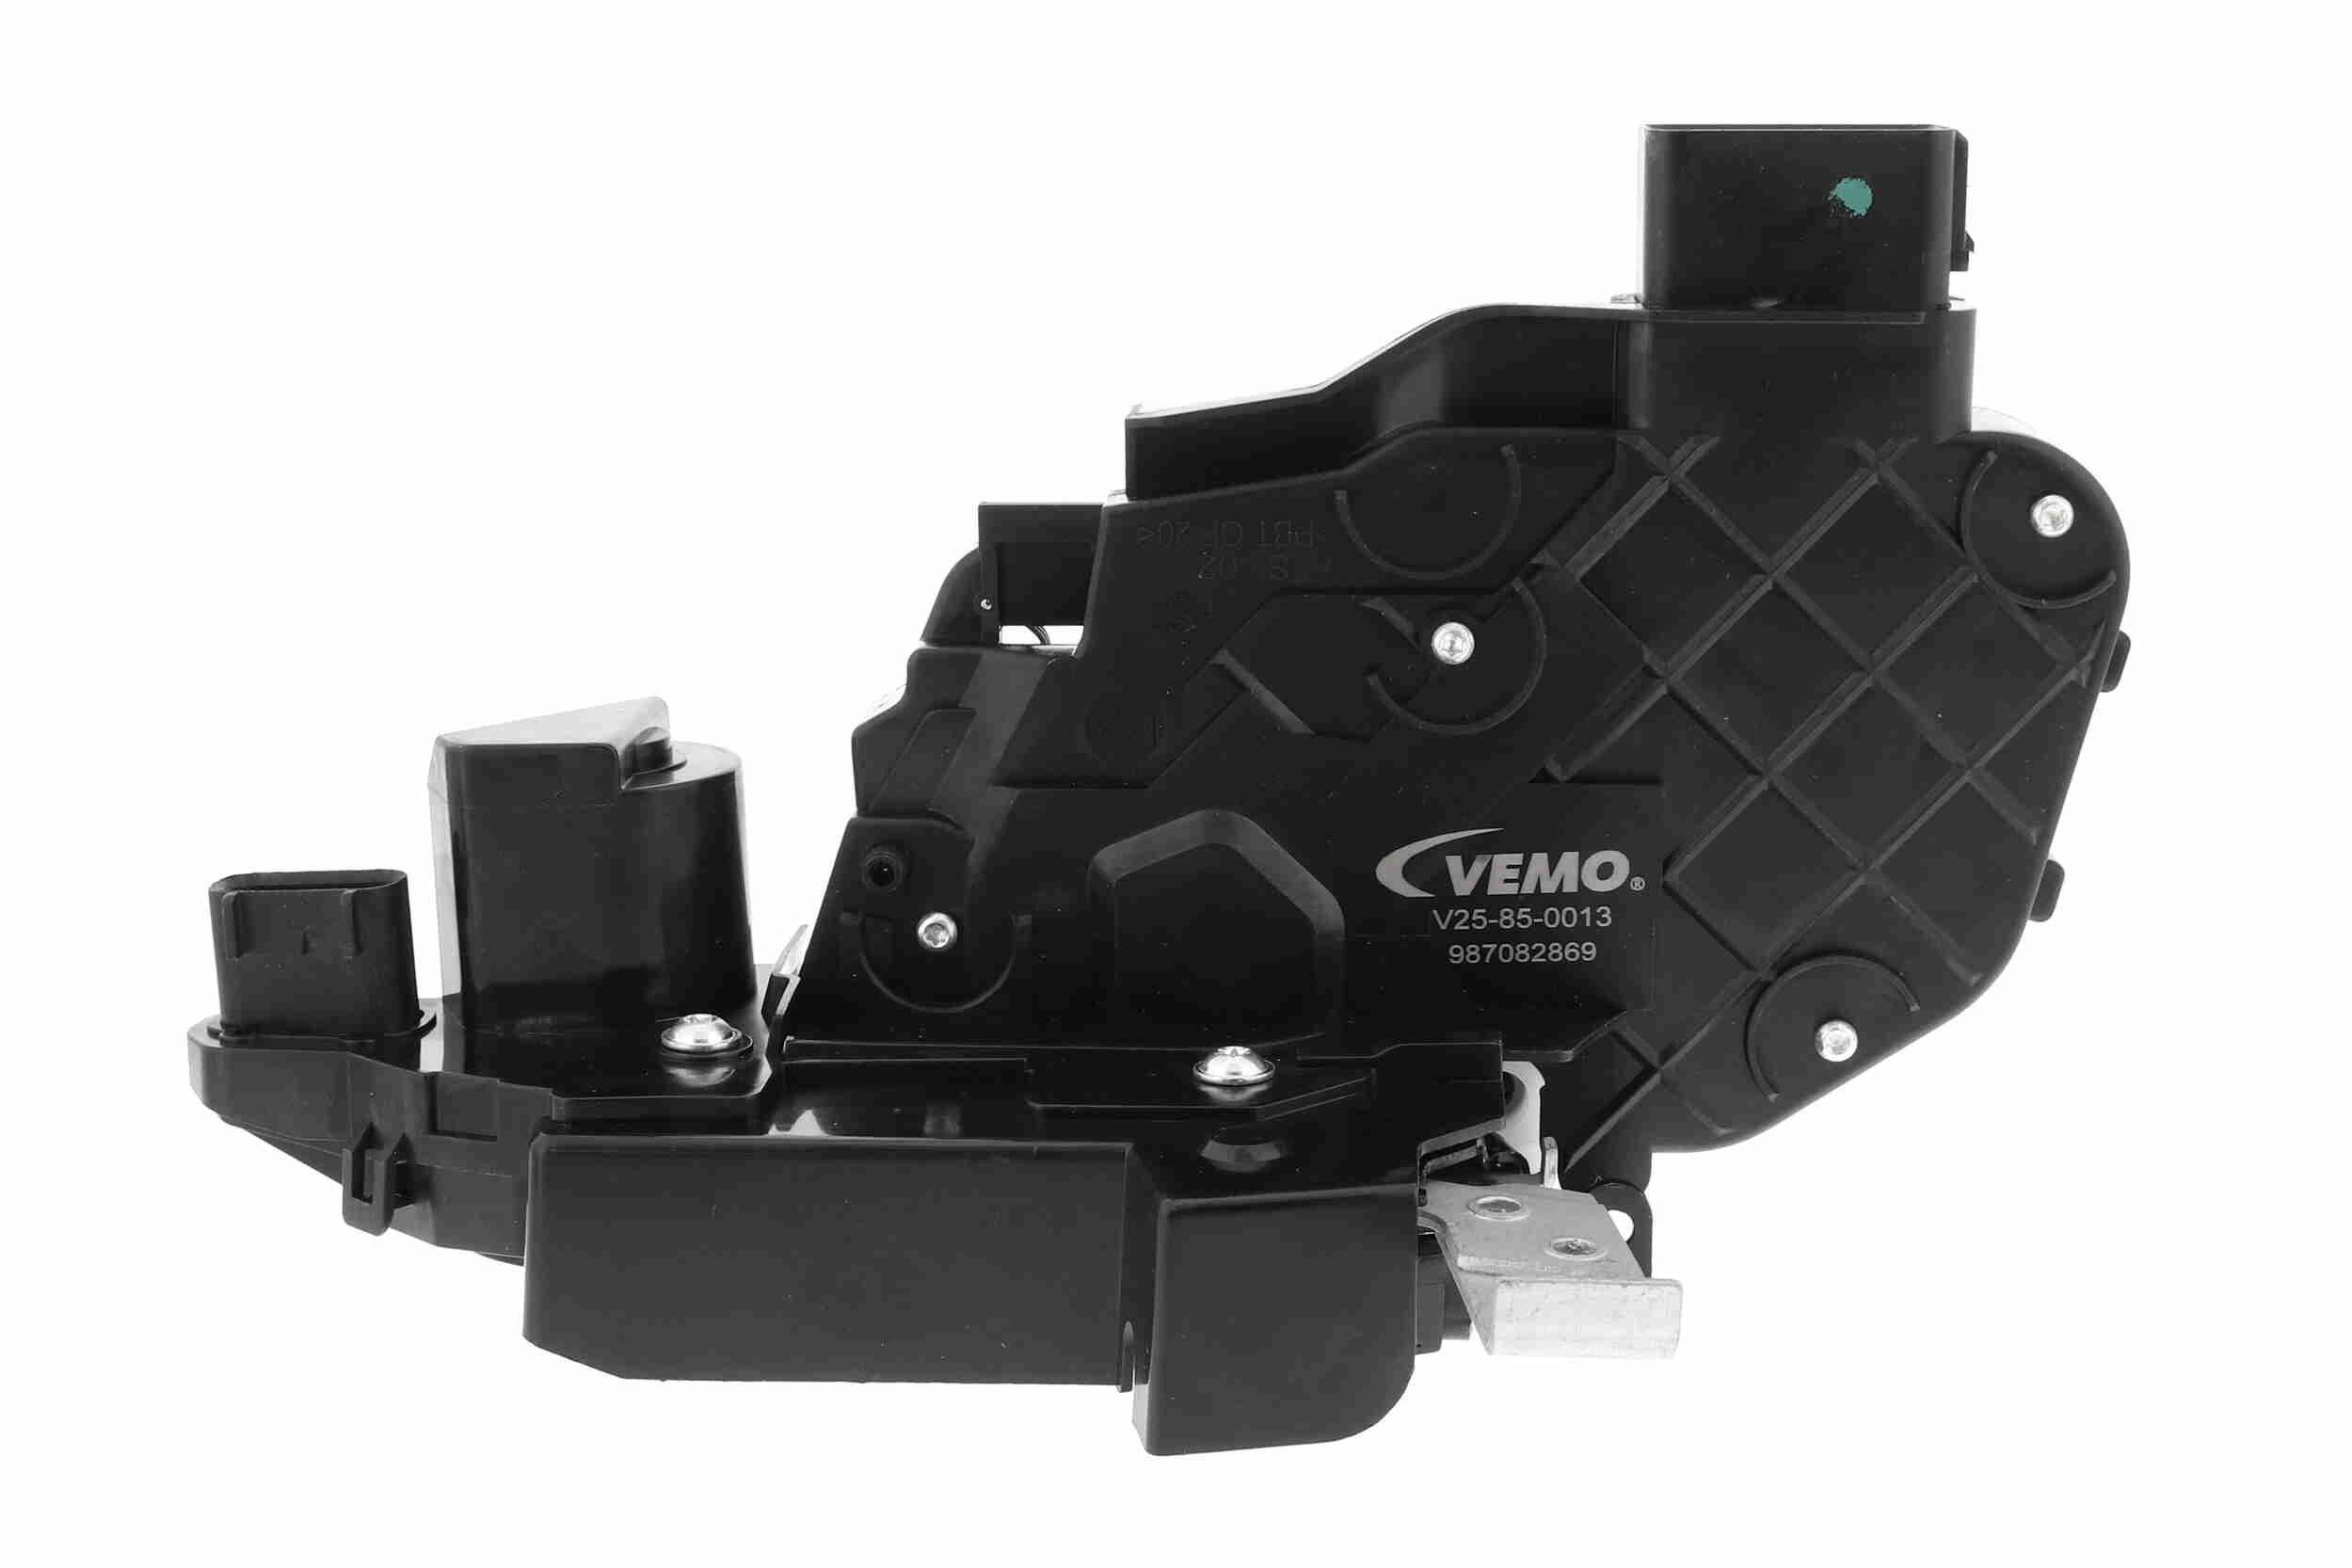 VEMO: Original Türschloß V25-85-0013 ()